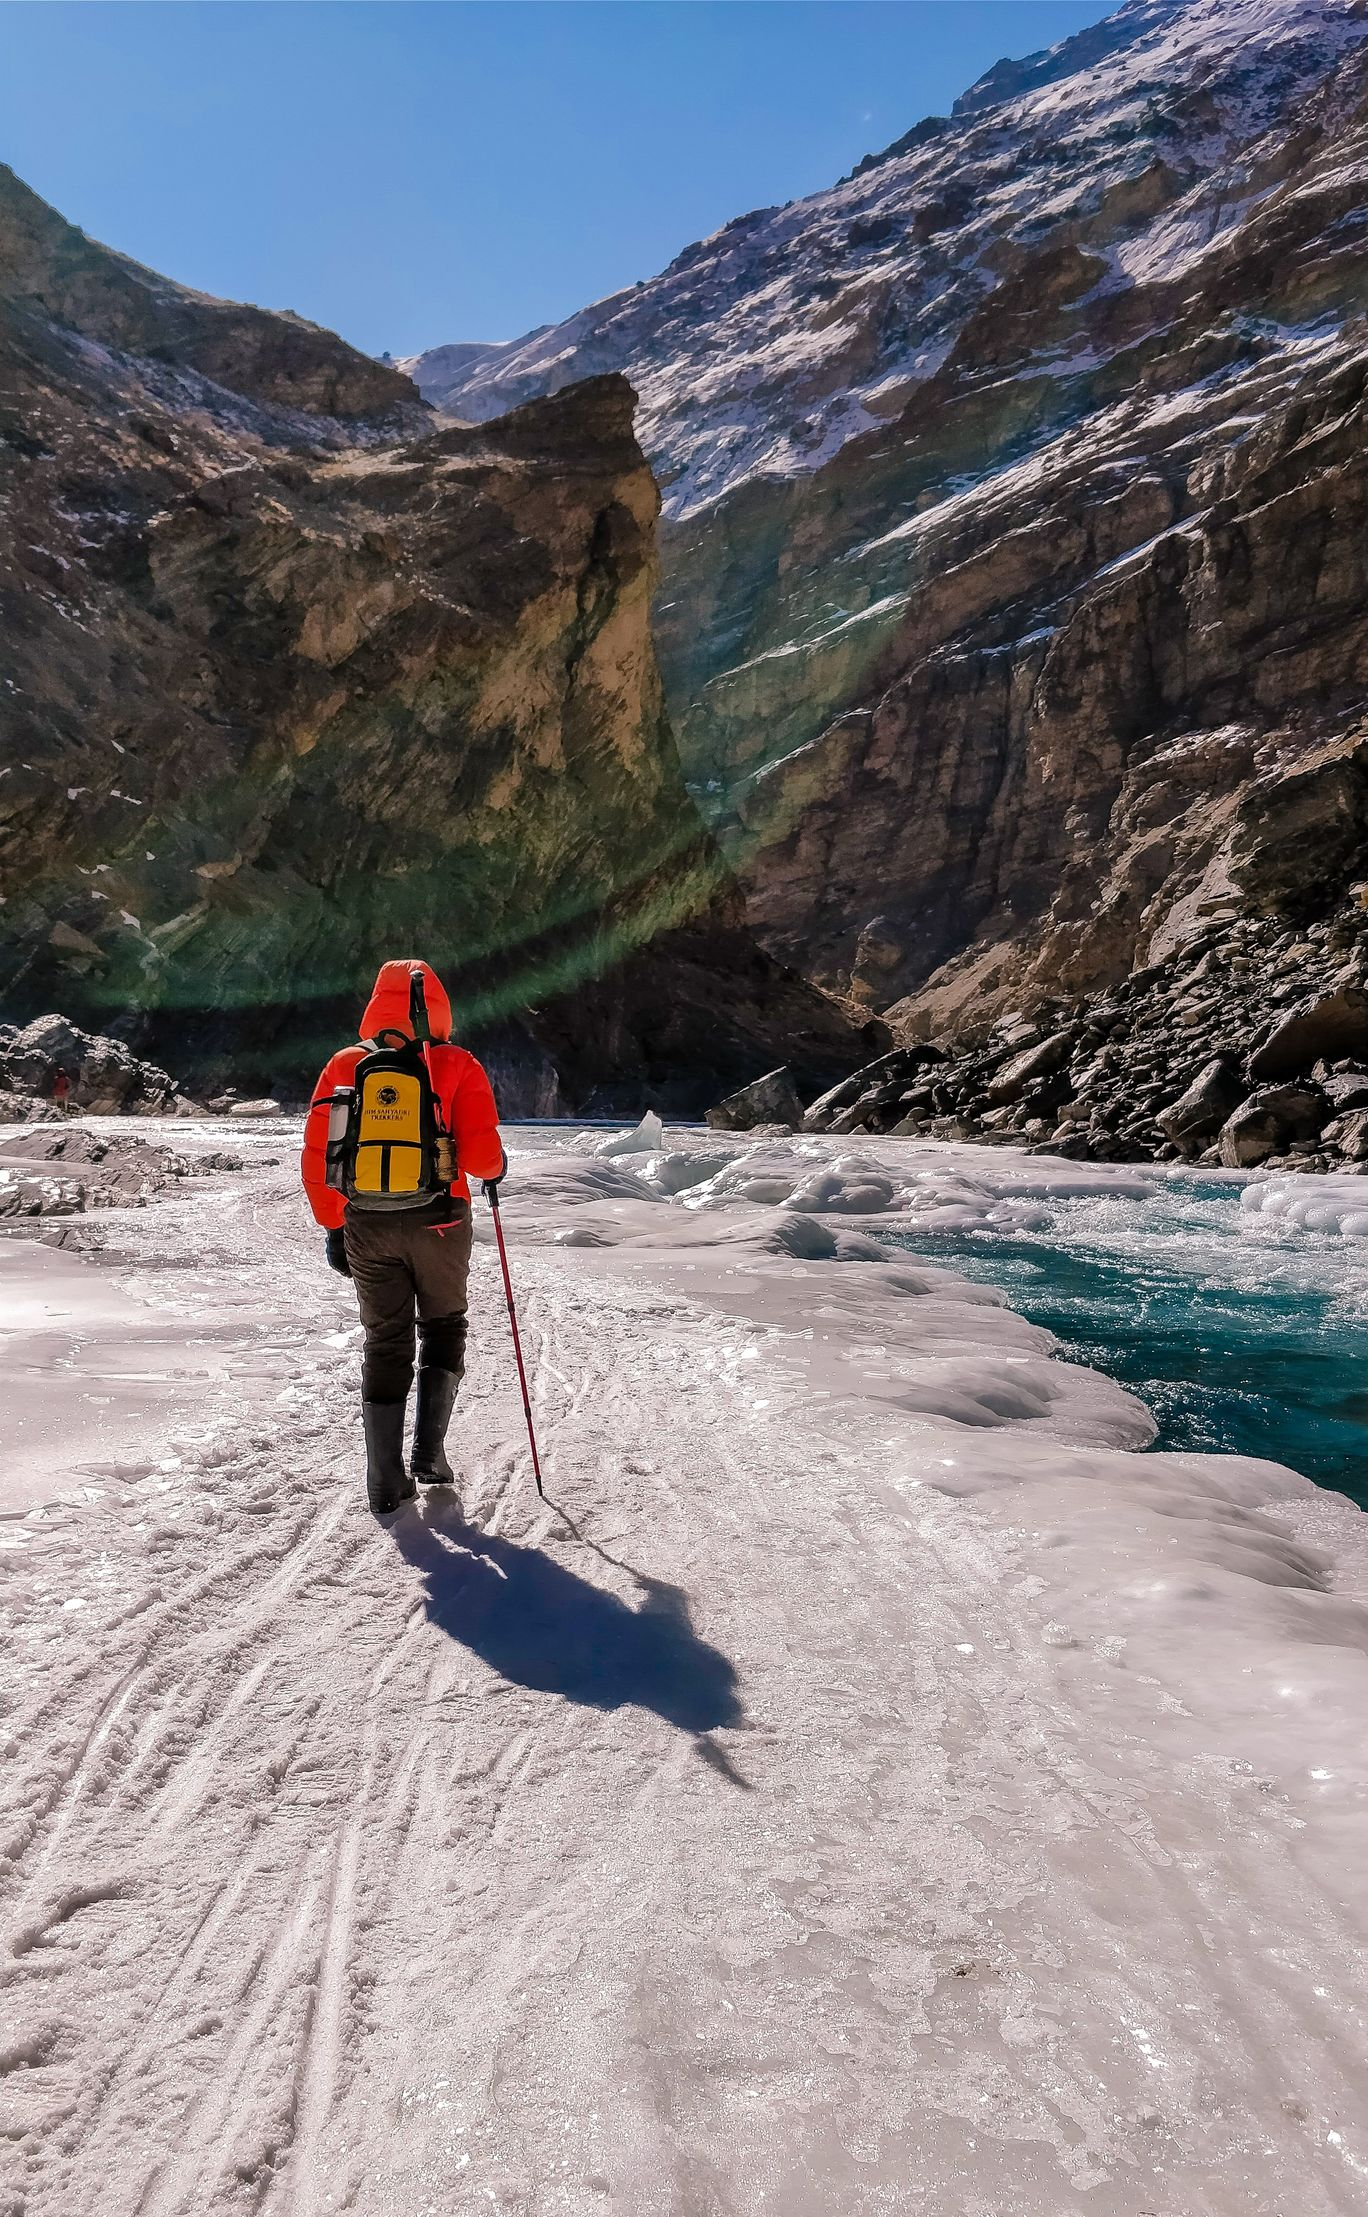 Photo of Chadar trek - Trekking In Ladakh - Frozen River Trekking In Ladakh By Sally Lopes